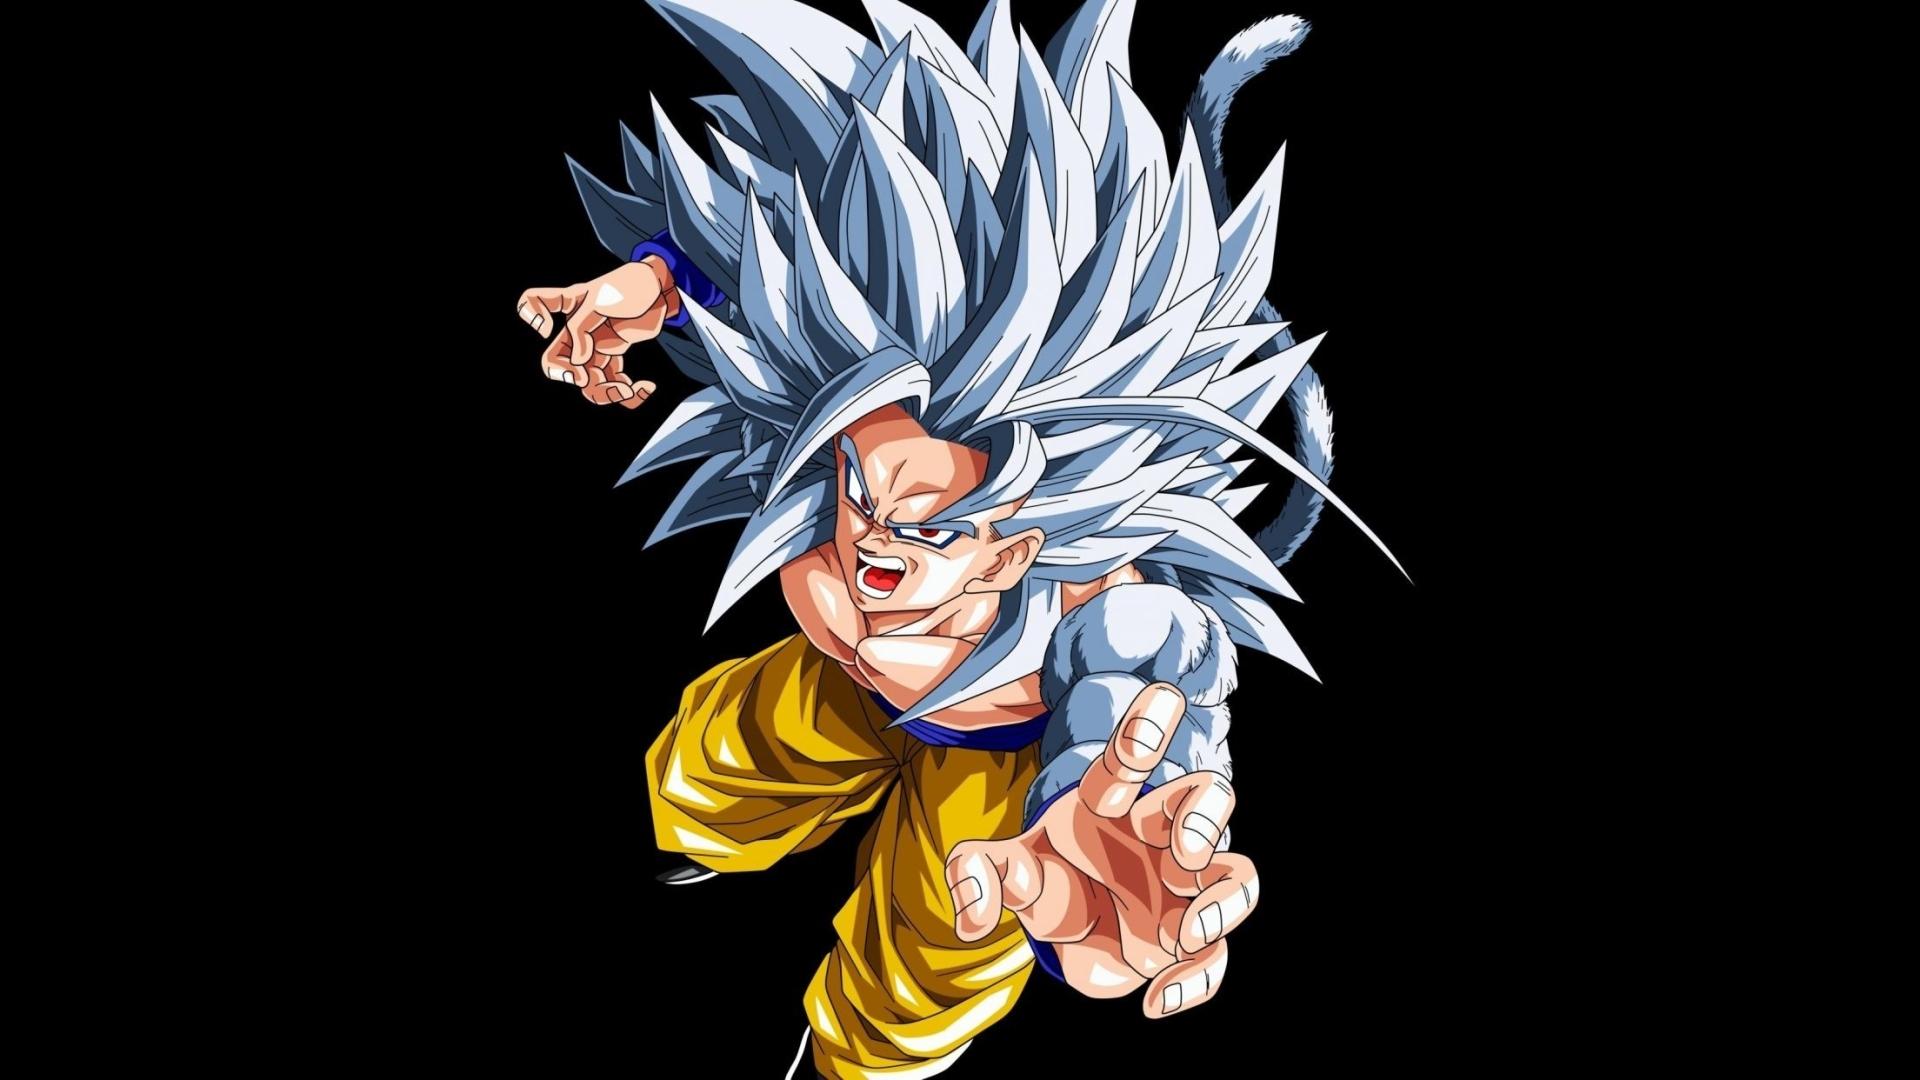 1920x1080 Goku Super Saiyan Ssj5 1080p Laptop Full Hd Wallpaper Hd Anime 4k Wallpapers Images Photos And Background